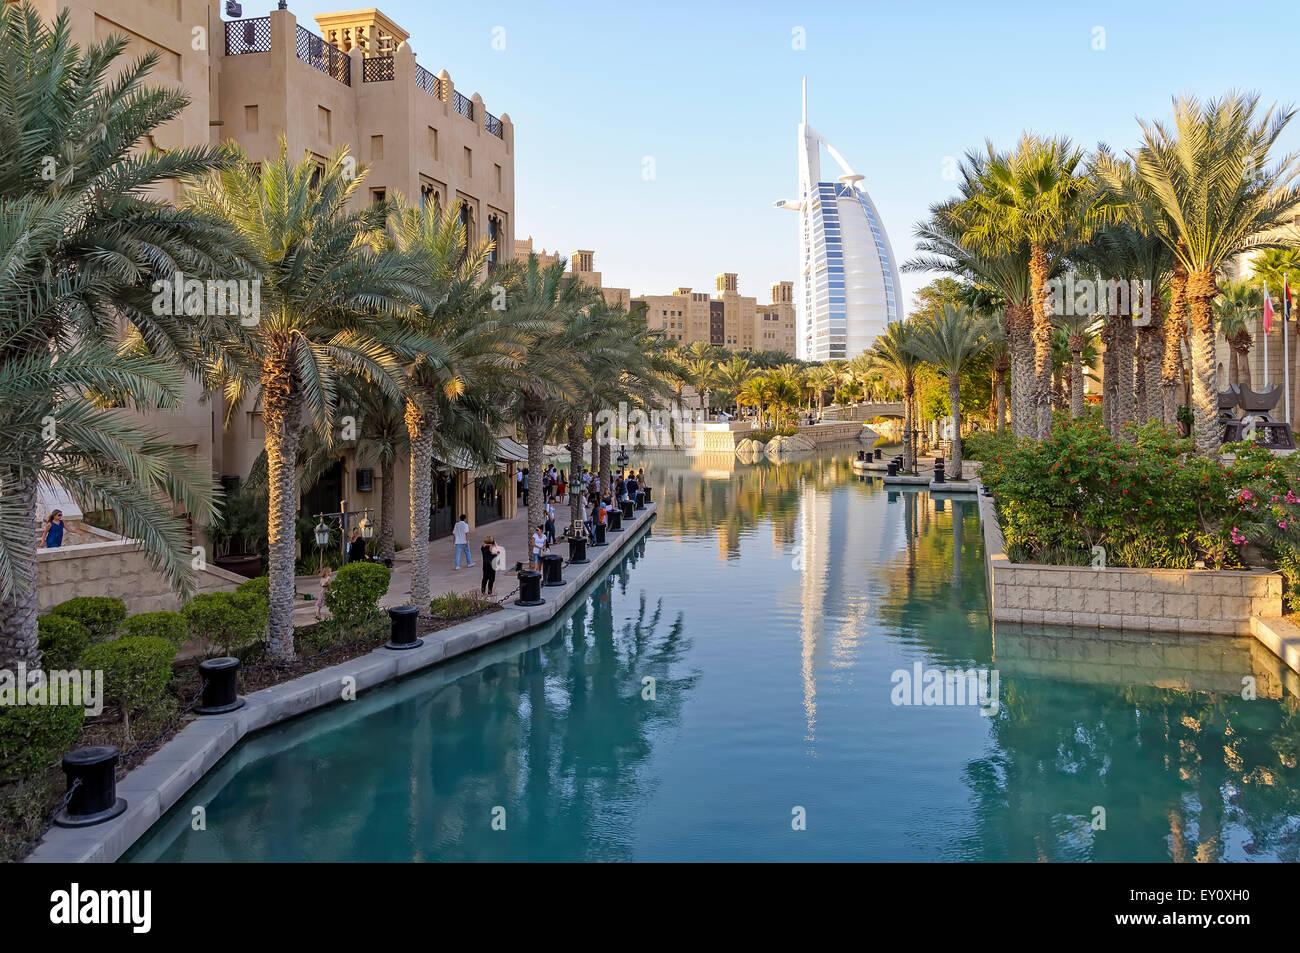 Dubai, UAE - January 08, 2012: View of Burj Al Arab from Madinat Jumeirah. Madinat is a luxurious resort in Dubai. - Stock Image